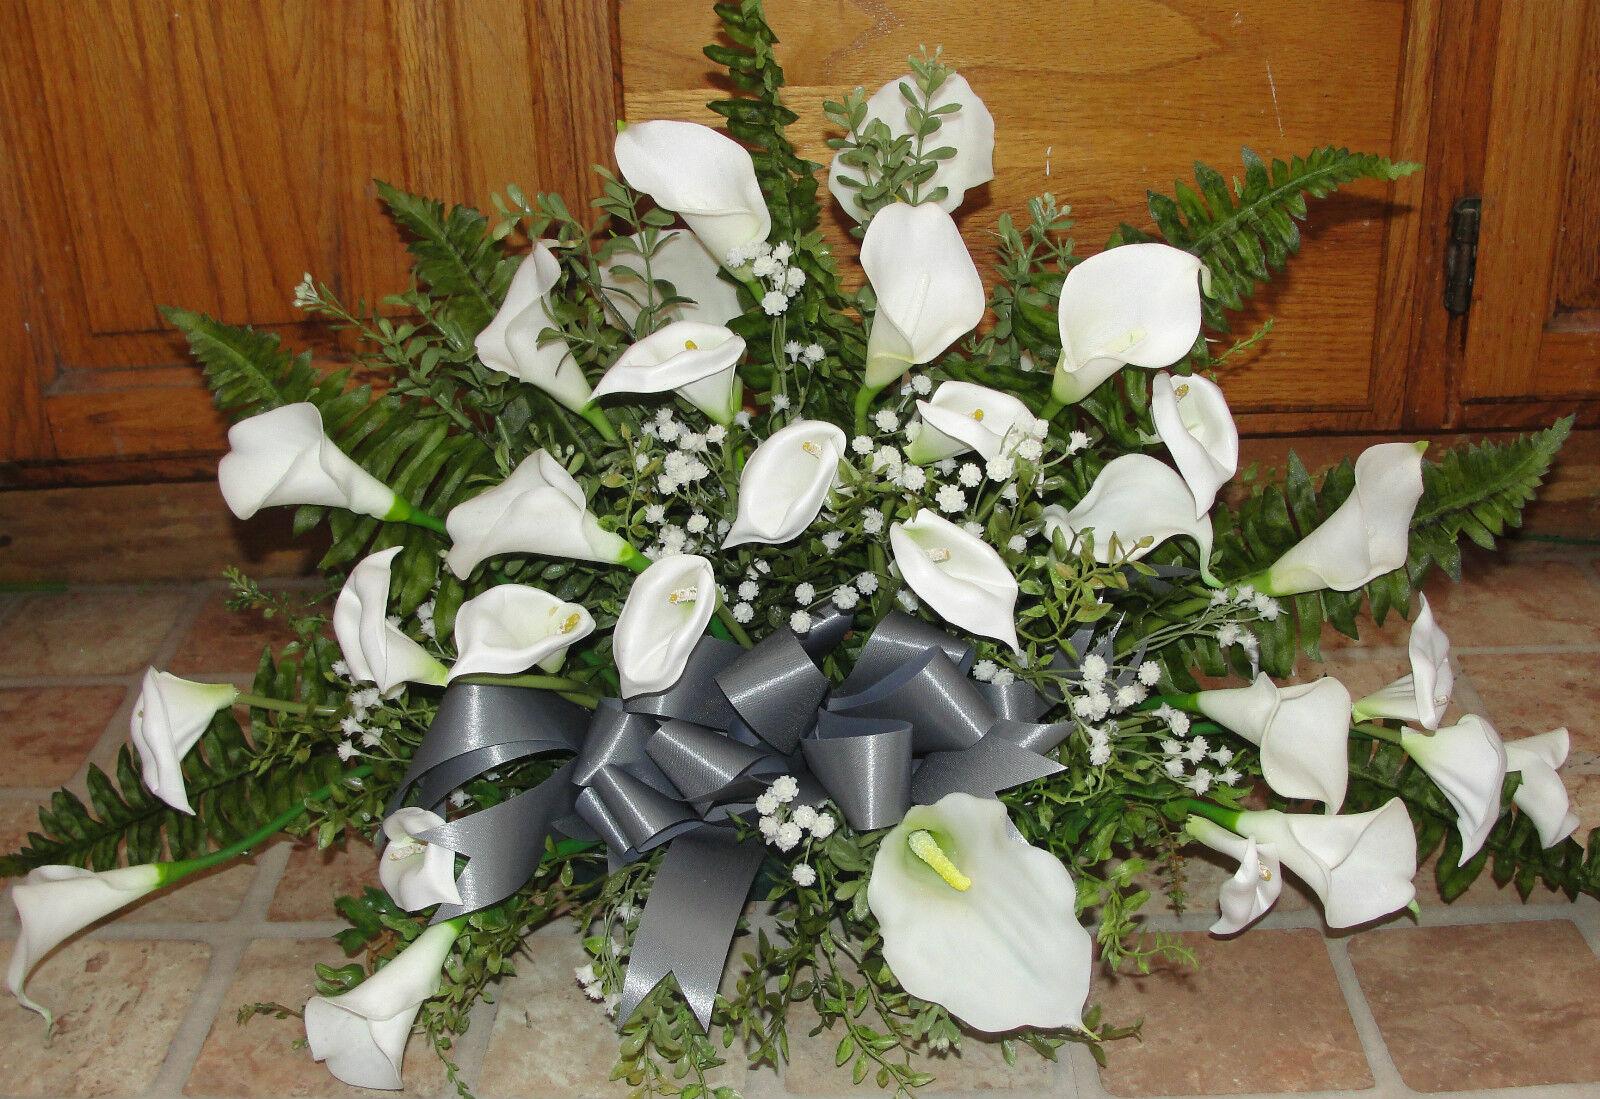 4 Calla Lily Table Centerpieces Silk Flowers Petite Bouquet to Match Altar Arrg